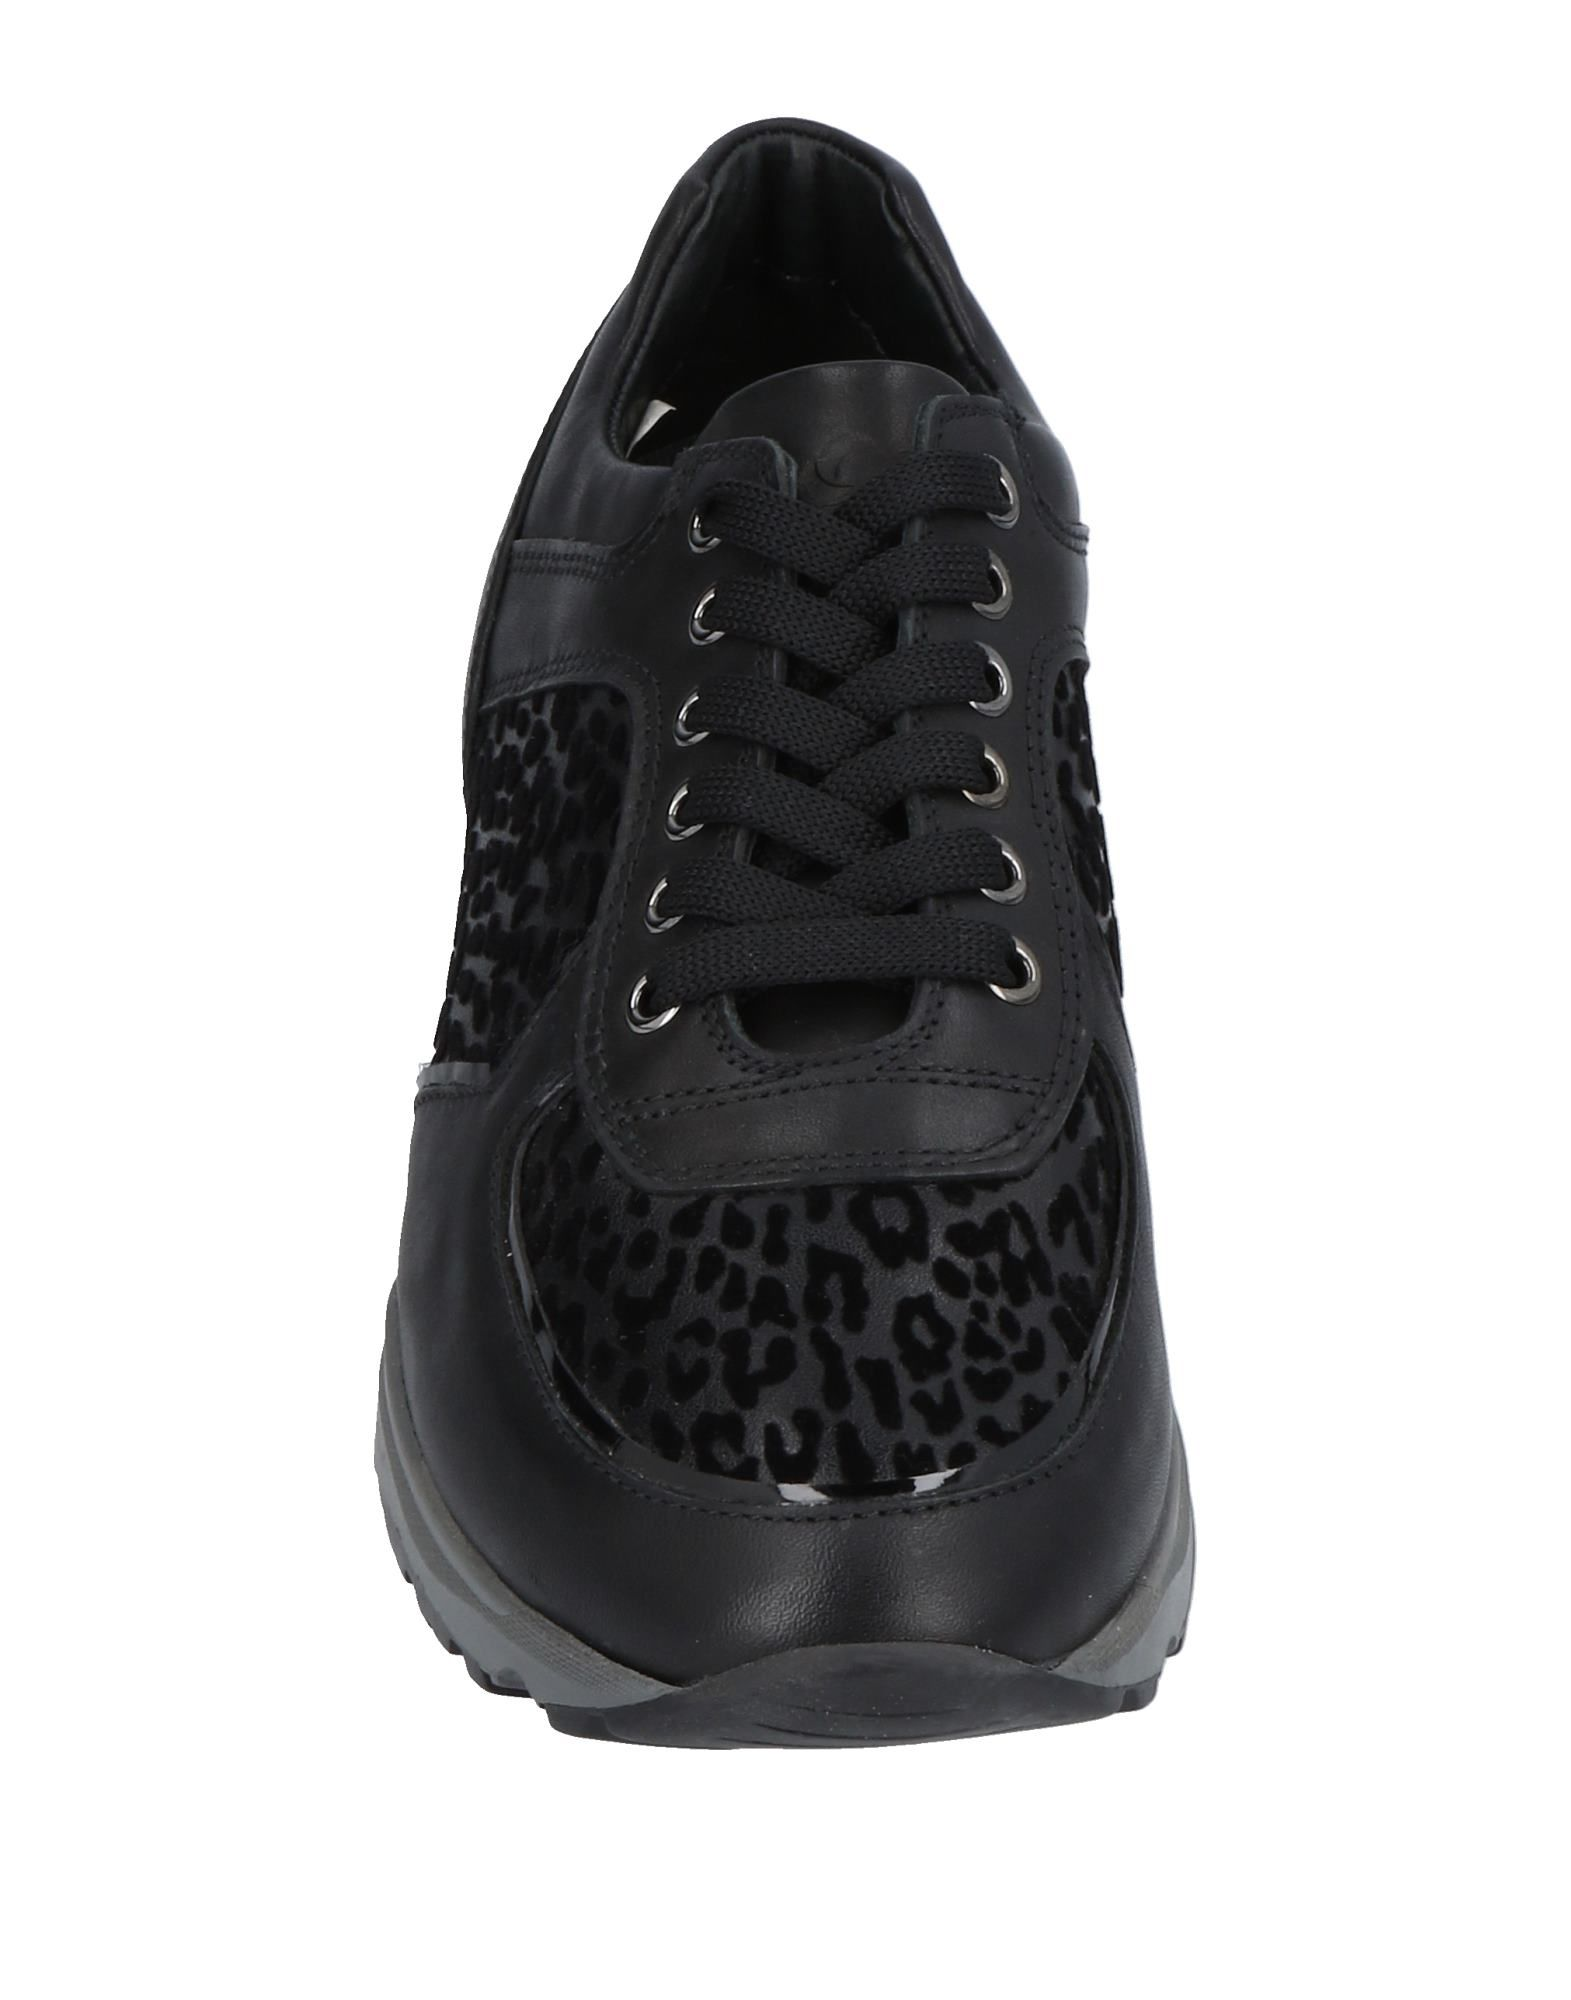 Samsonite Sneakers Damen  11468320TM Schuhe Gute Qualität beliebte Schuhe 11468320TM f86c45